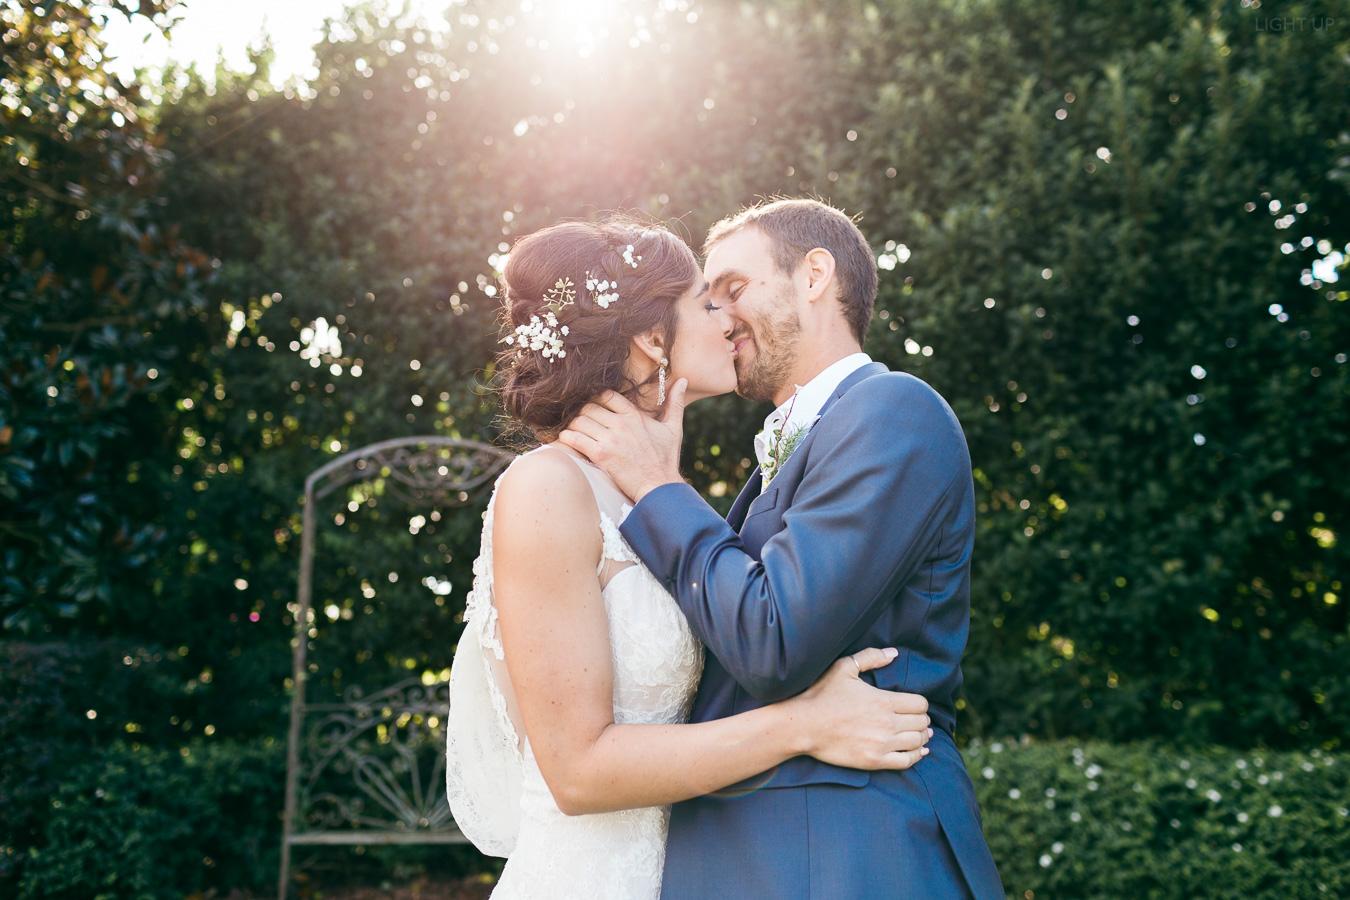 Wedding-photographer-orlando-33.jpg